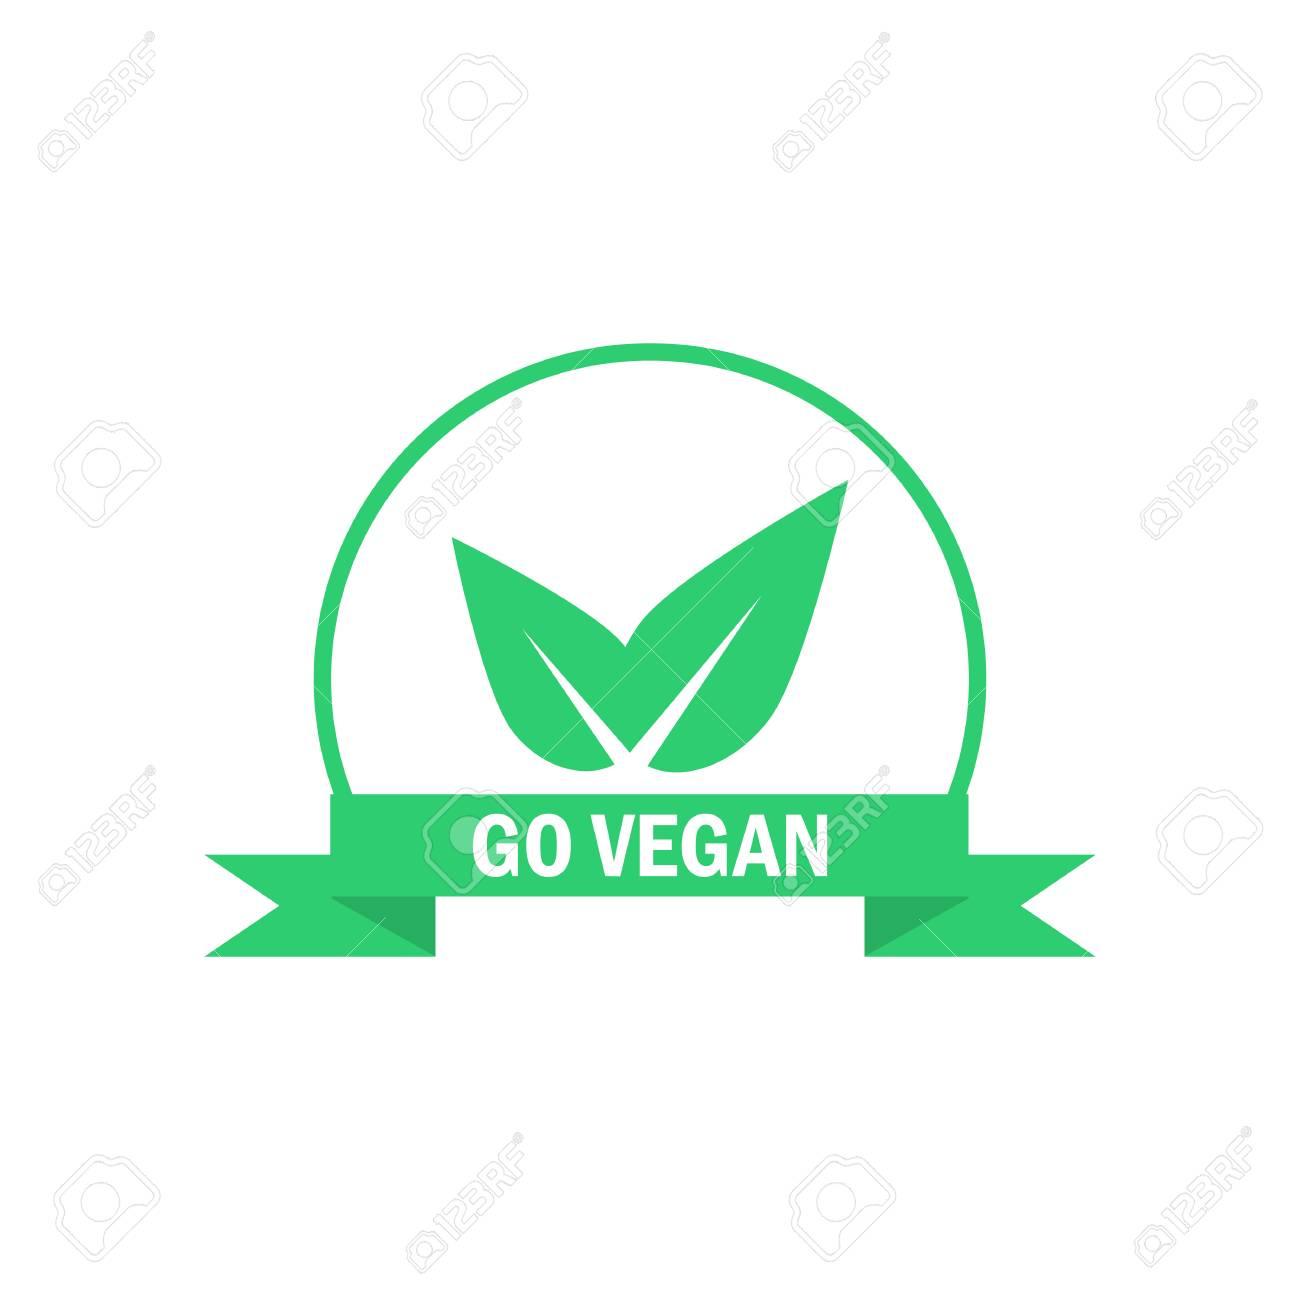 Go vegan label  Green food icon  Suitable for vegetarian sticker